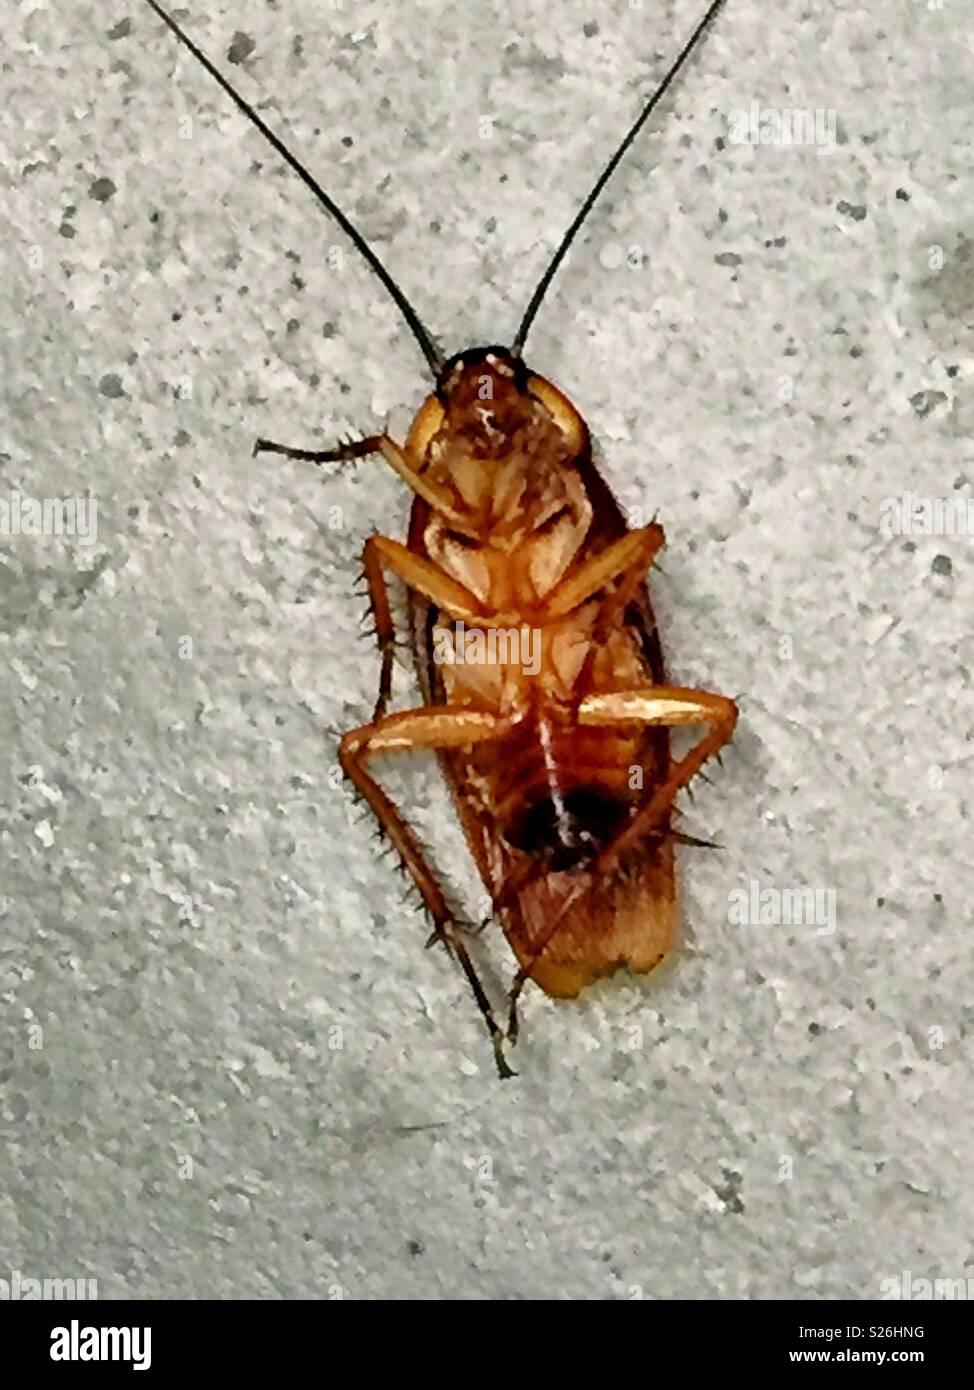 A dead cockroach on a concrete floor, USA - Stock Image